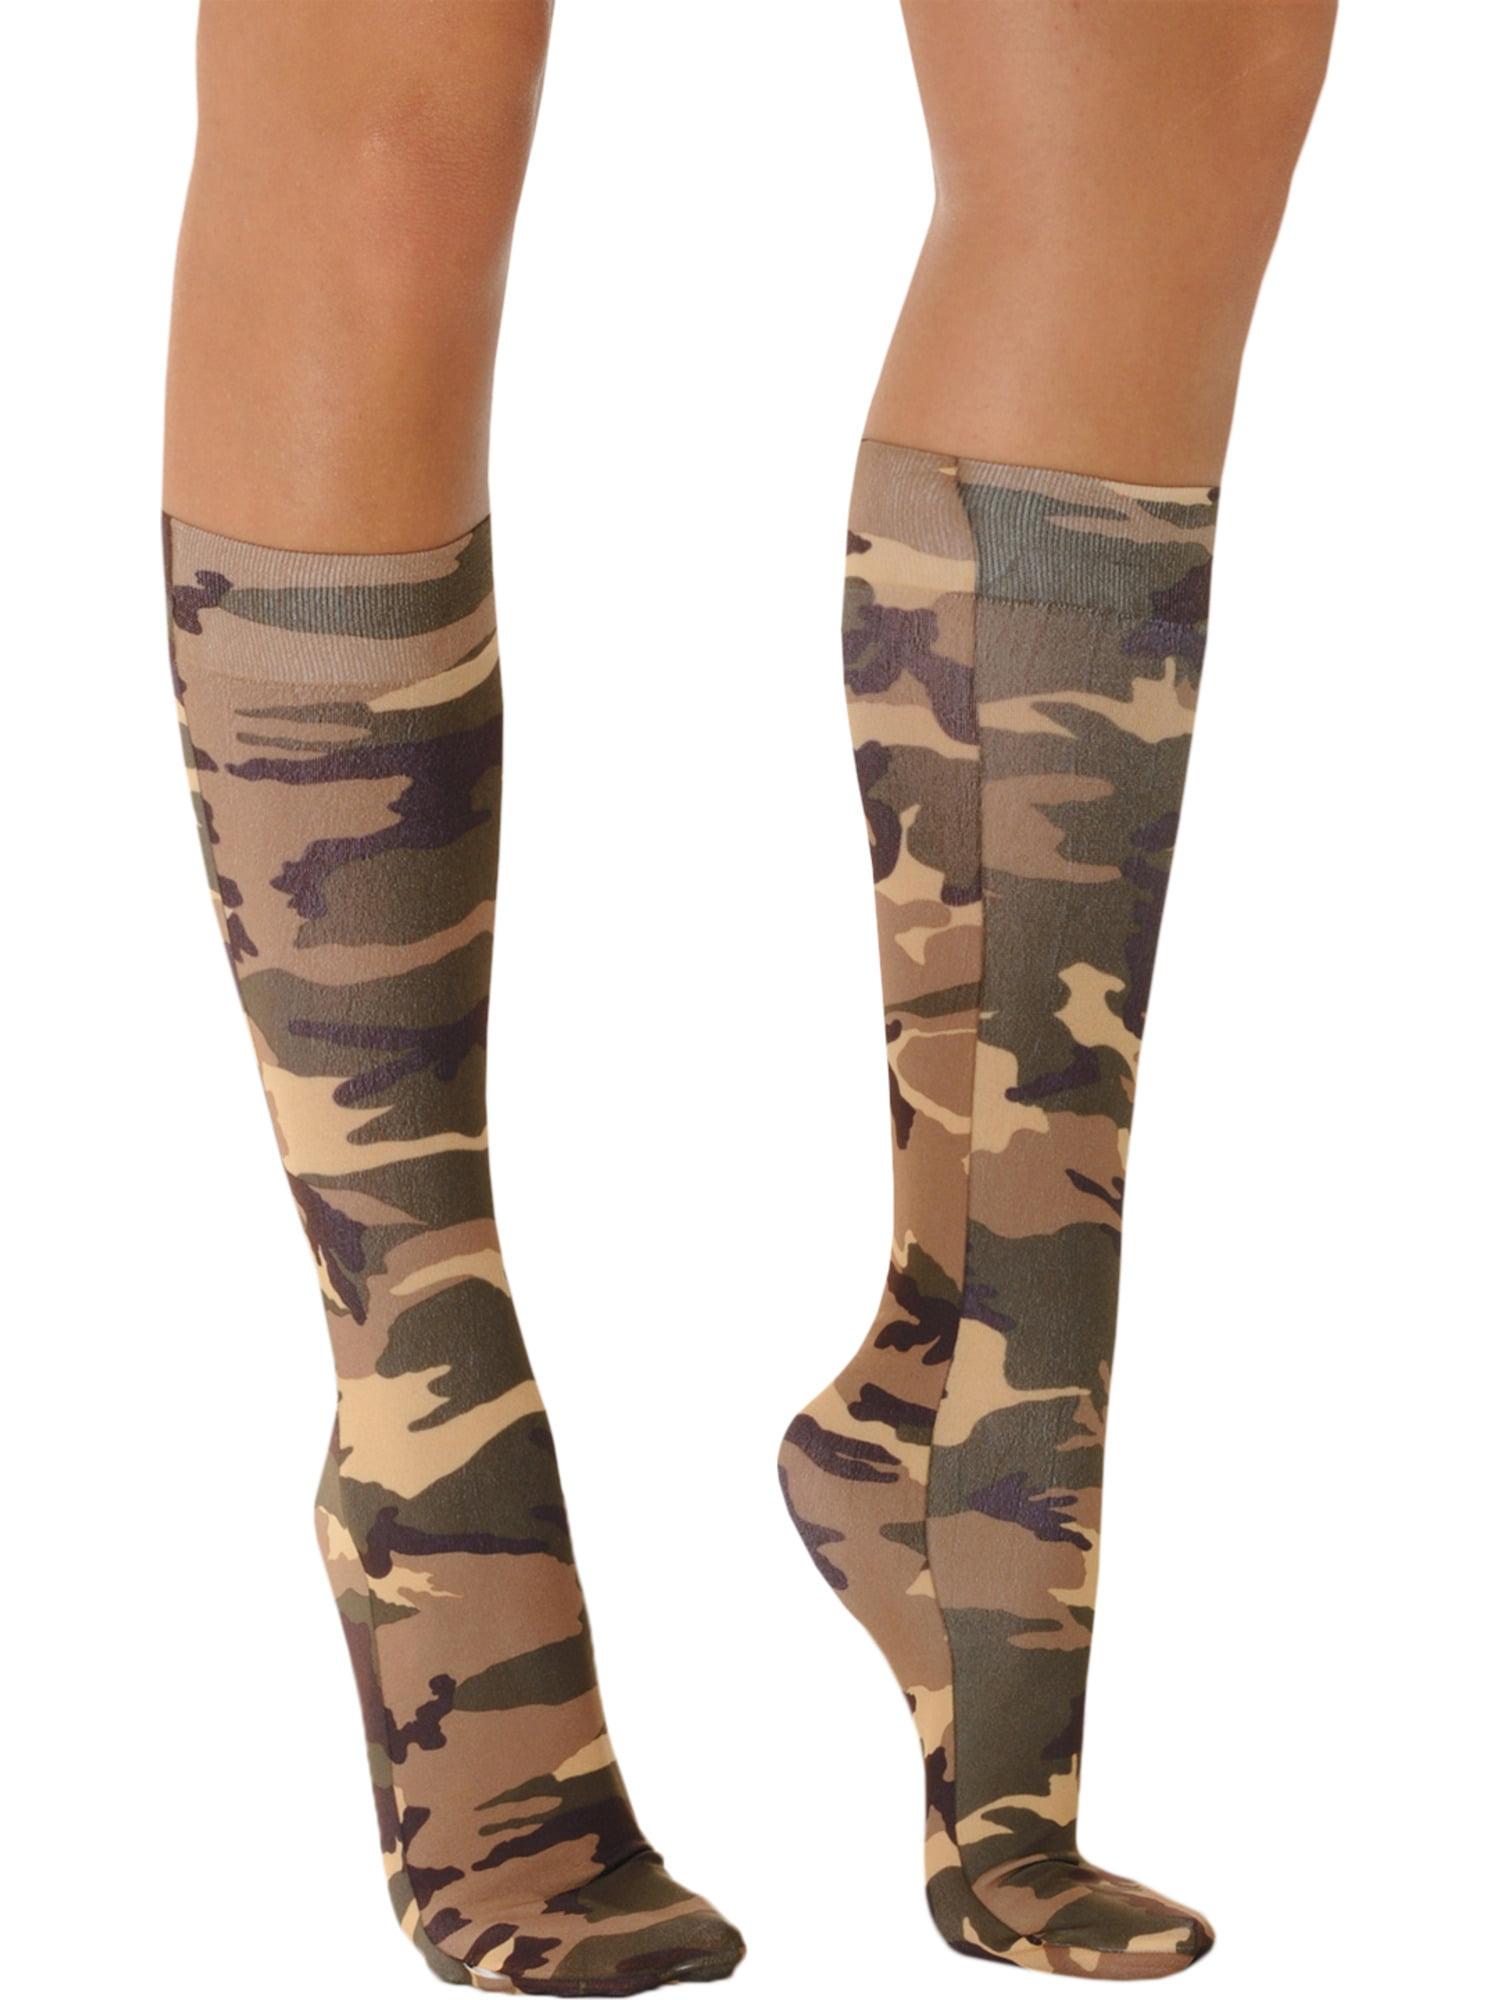 2cb11c03dd8 Celeste - Camo Socks Knee High Trouser Womens Sock Military Army Costume  Accessory Soxs Sizes  One Size - Walmart.com